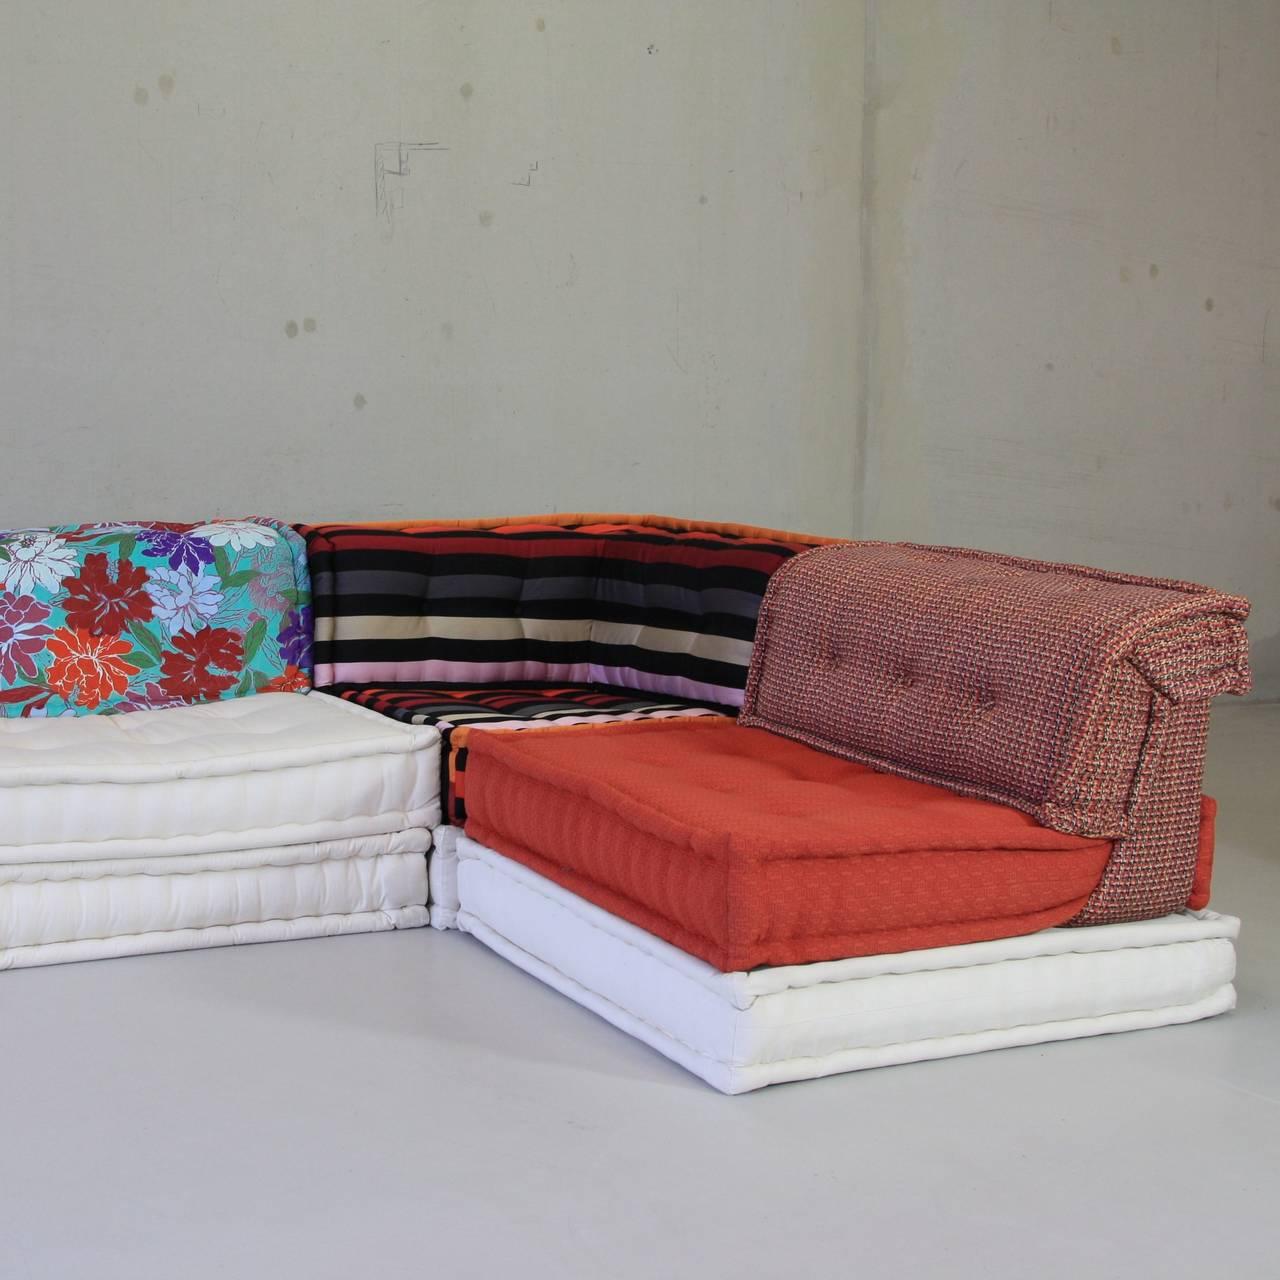 roche bobois mah jong sofa at 1stdibs. Black Bedroom Furniture Sets. Home Design Ideas